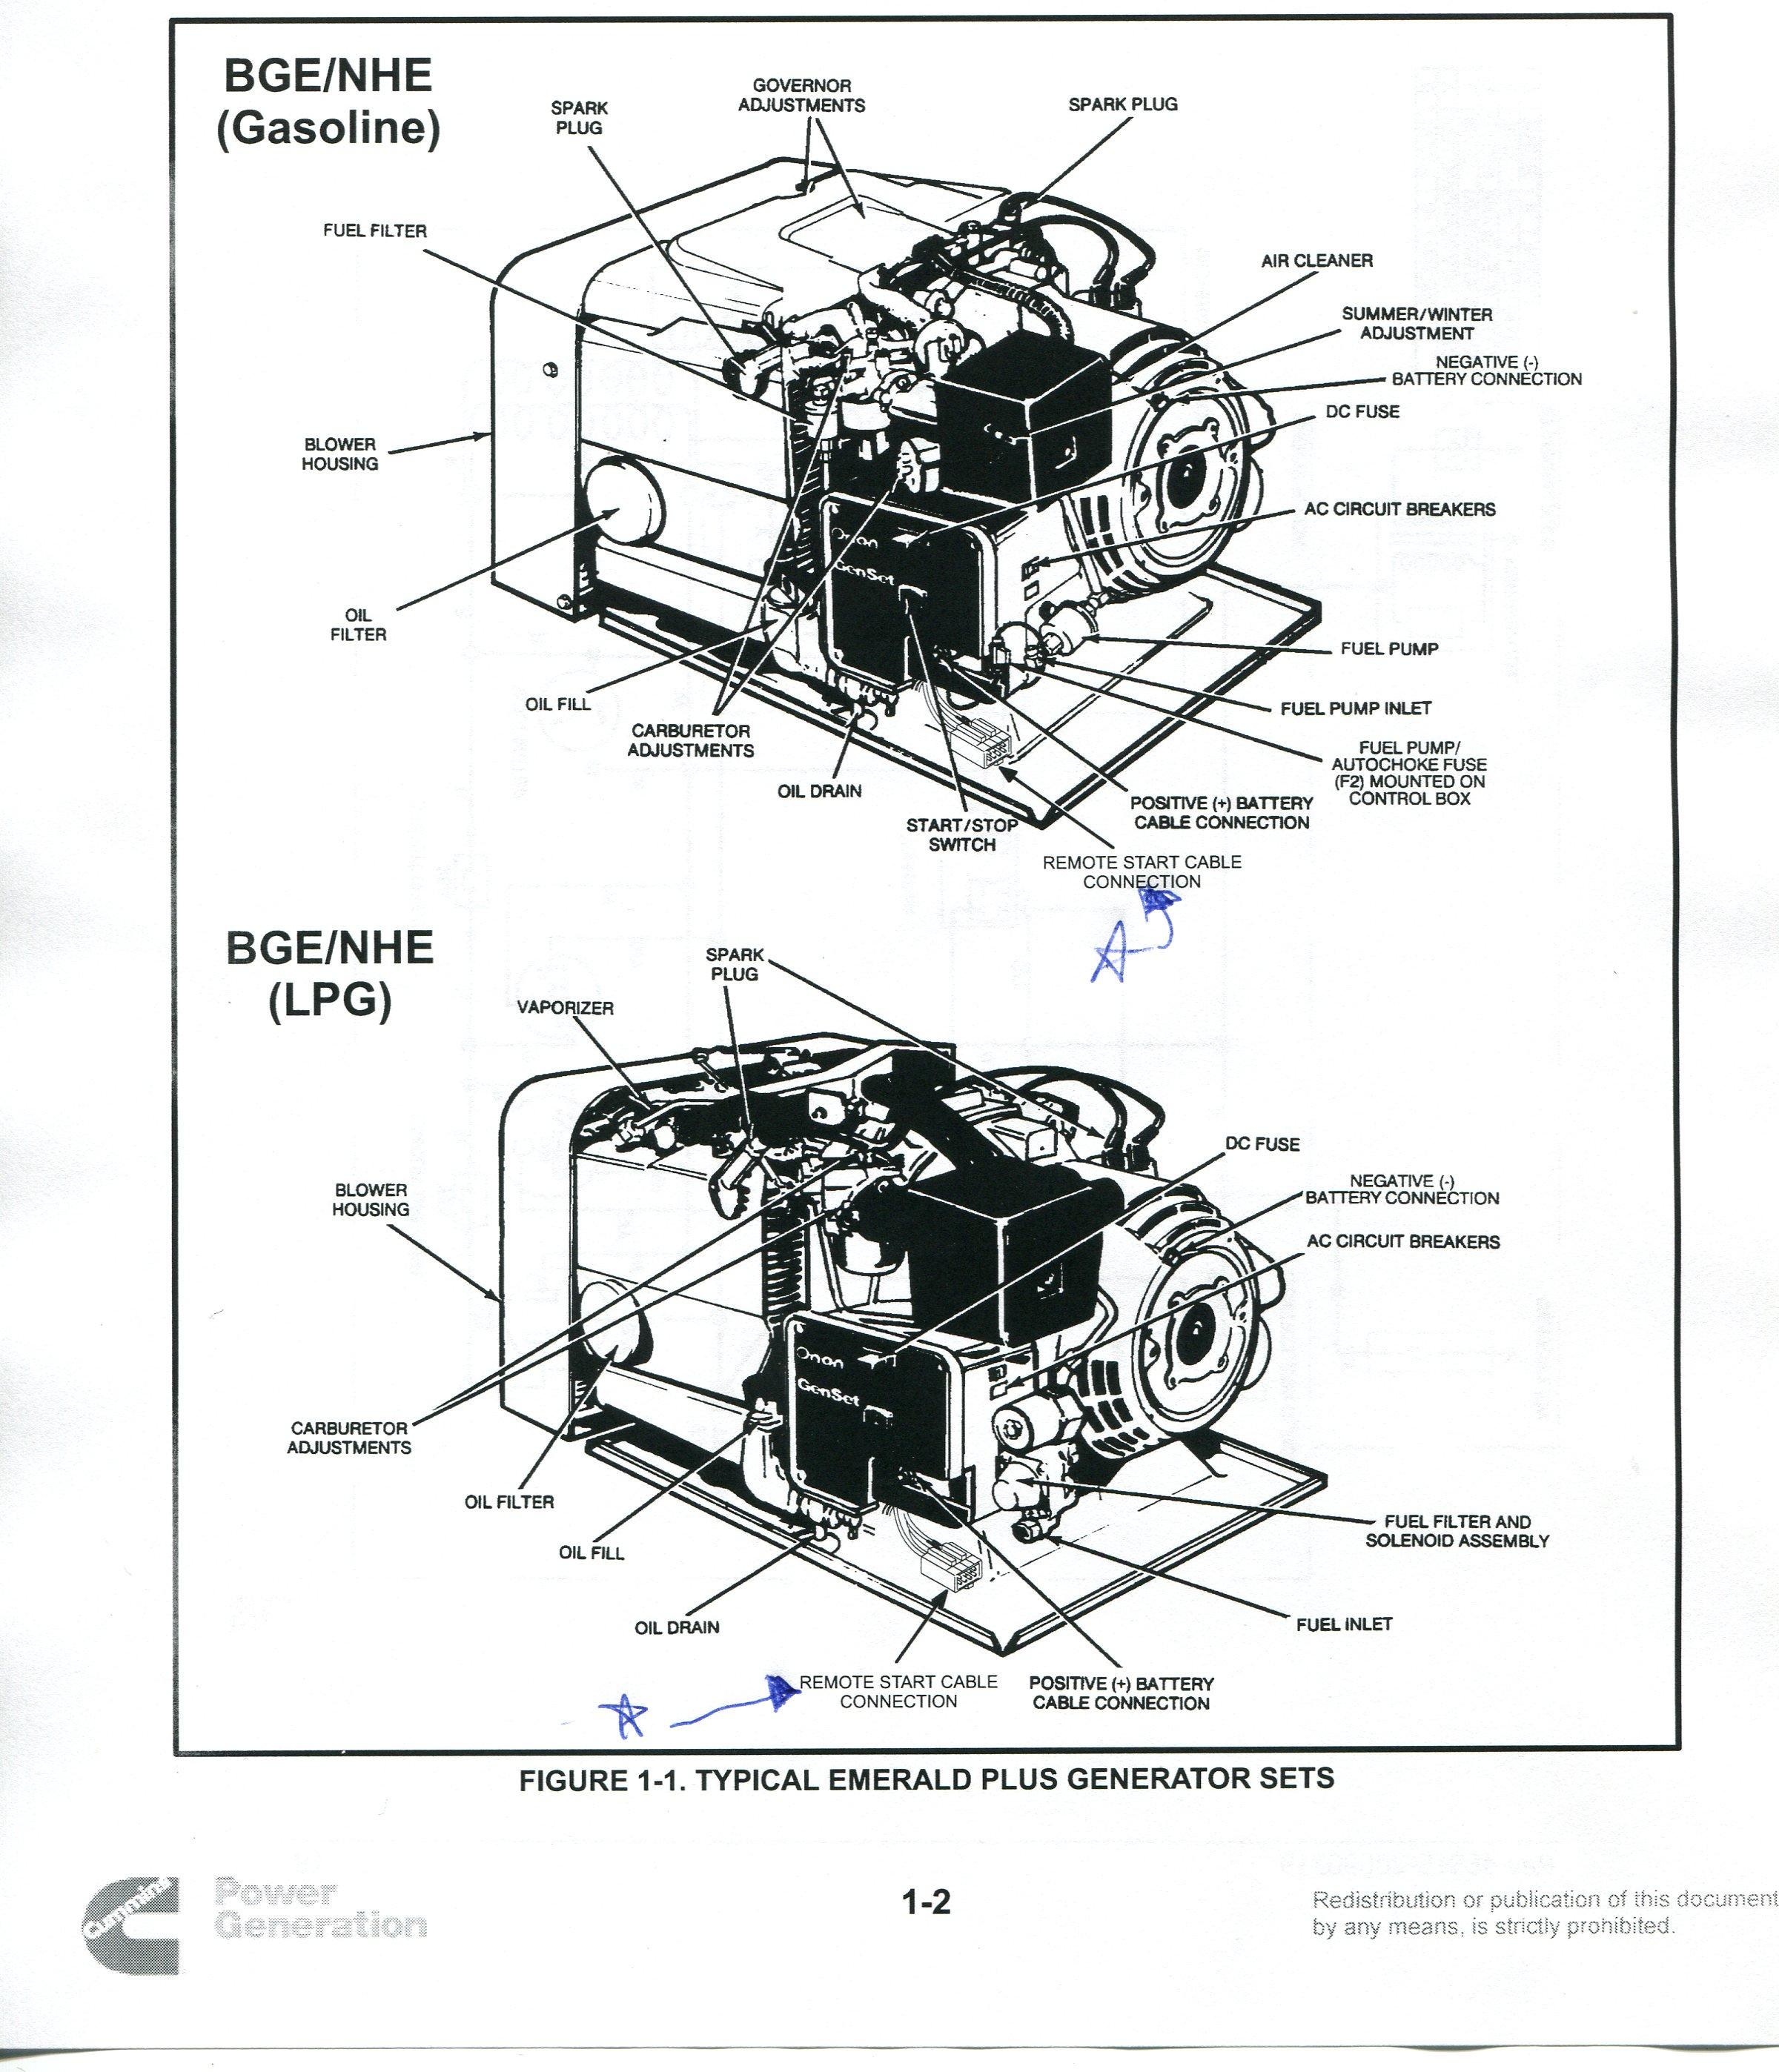 [NRIO_4796]   ZV_3532] Starter Generator Wiring On Onan Genset Remote Starter Wiring  Diagram Download Diagram | Wiring Diagram Onan Genset |  | Momece None Proe Ratag Vira Mohammedshrine Librar Wiring 101